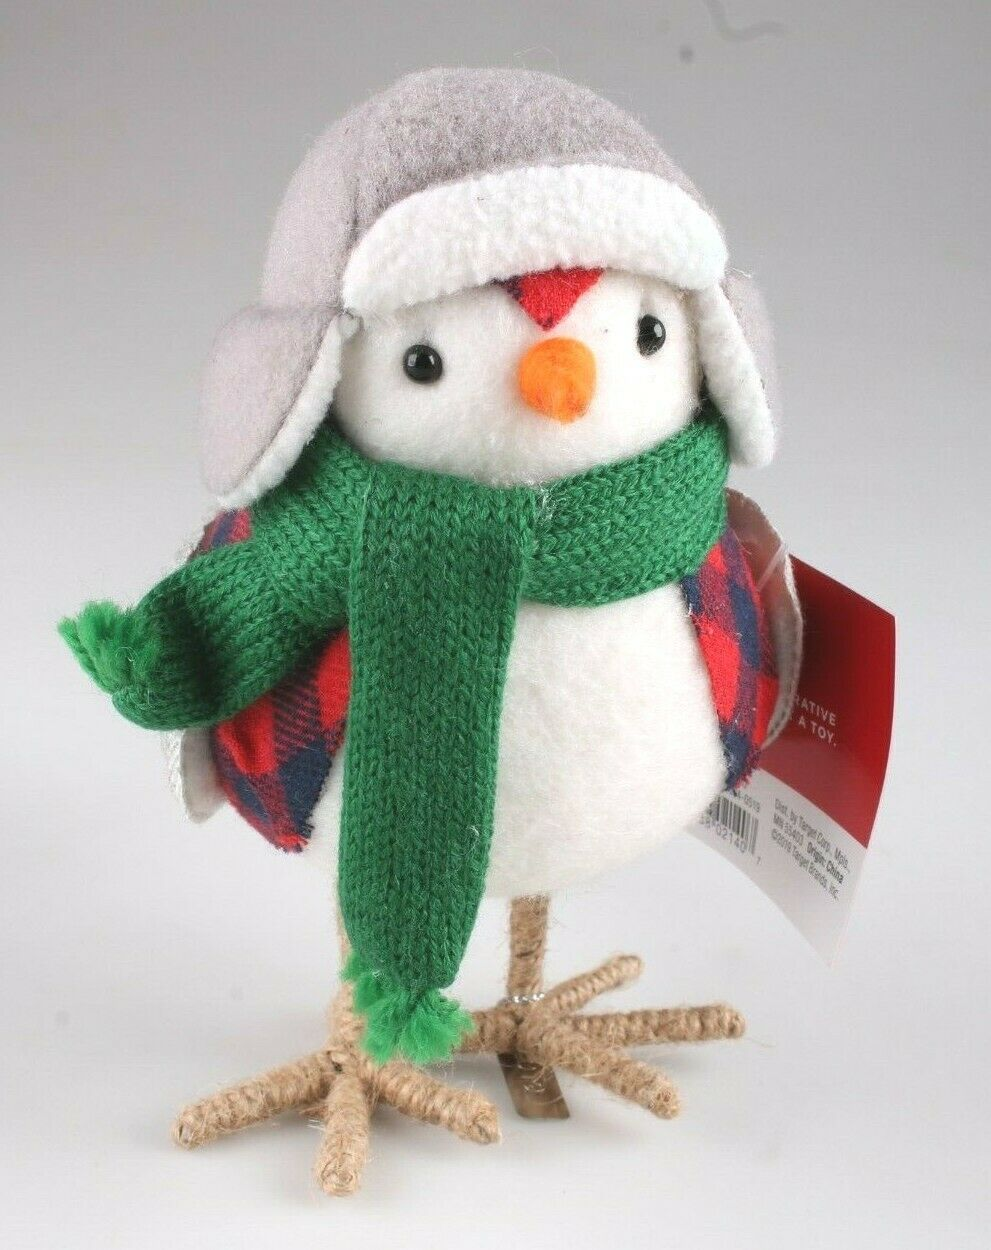 Target Christmas Bird Figure Holiday Decor 2019 Bayham Featherly Snow Bird